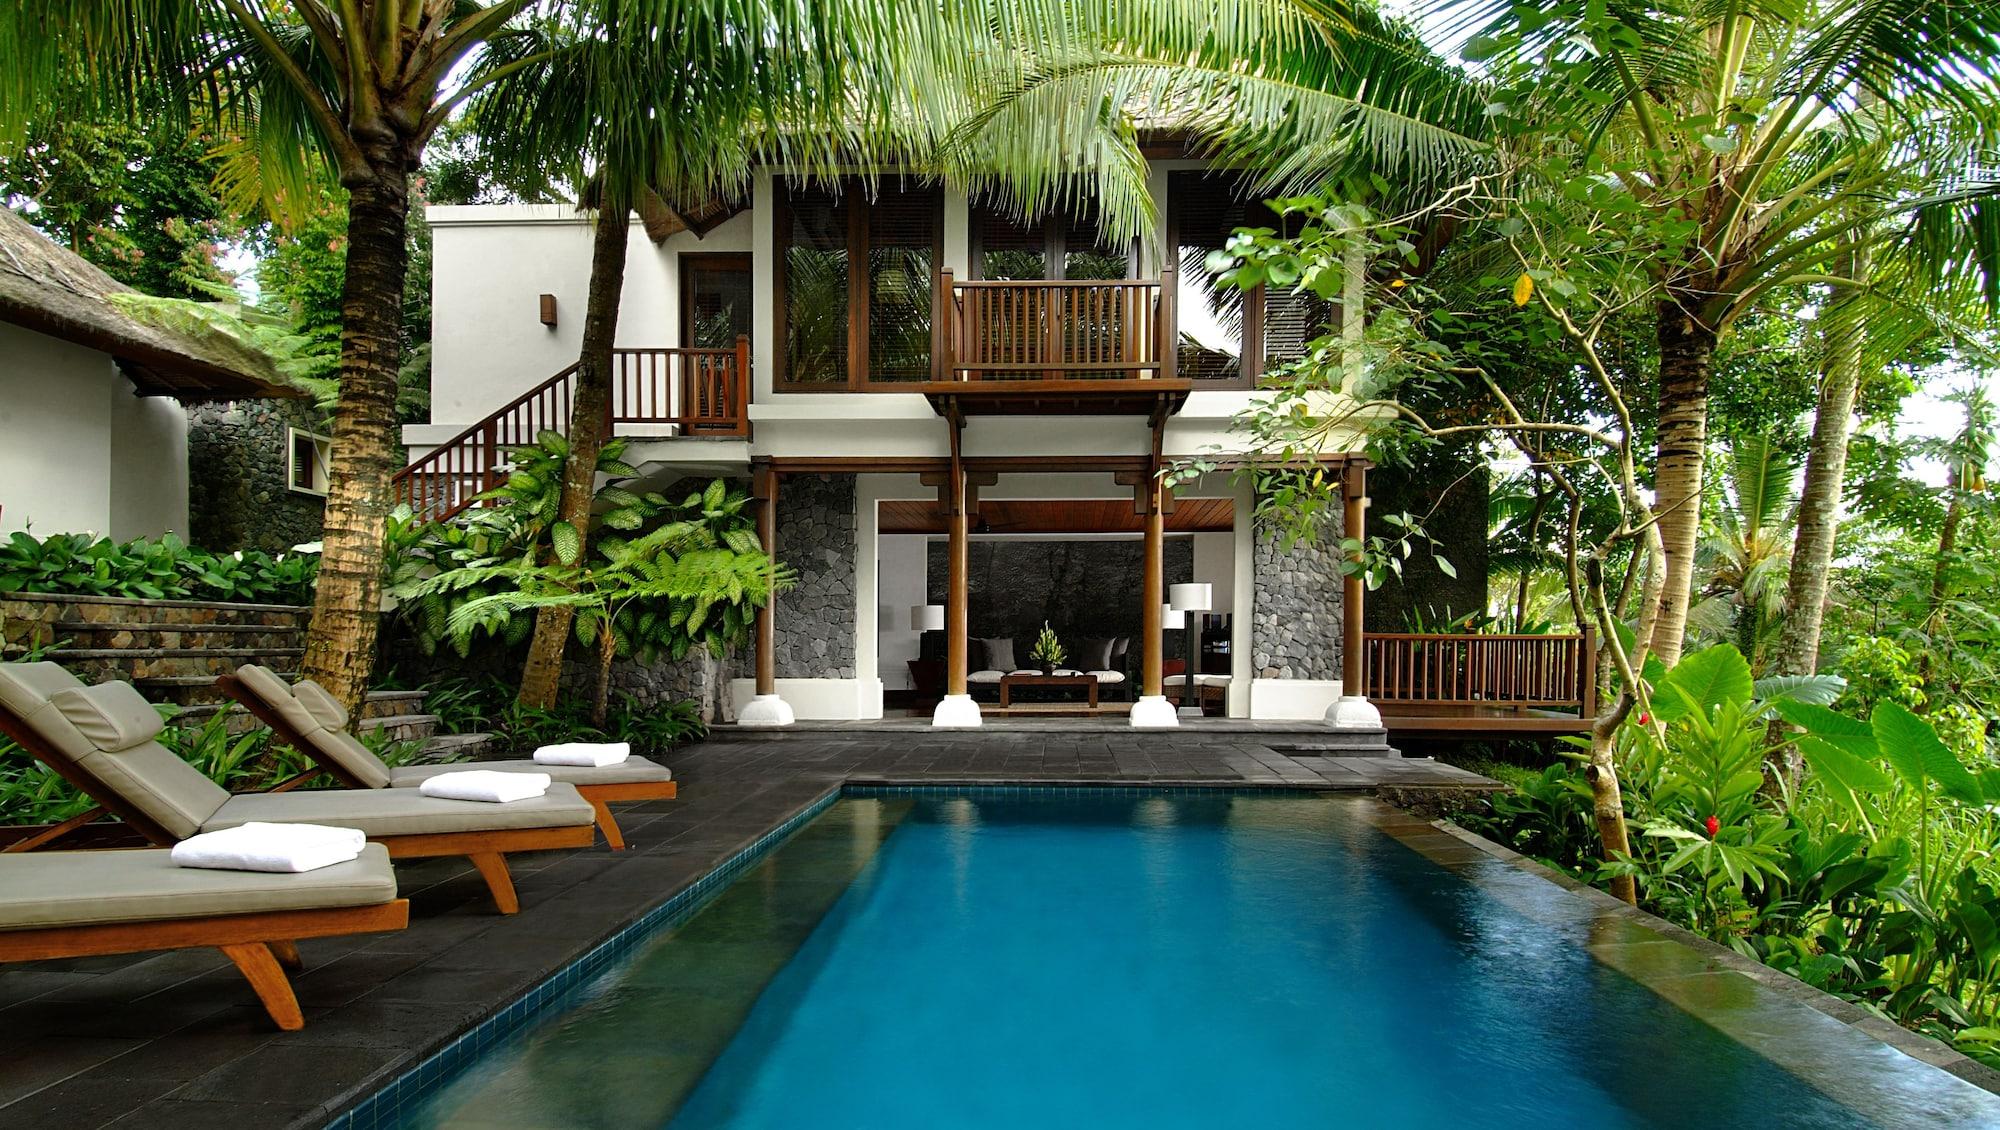 Kayumanis Ubud Private Villa and Spa, Gianyar